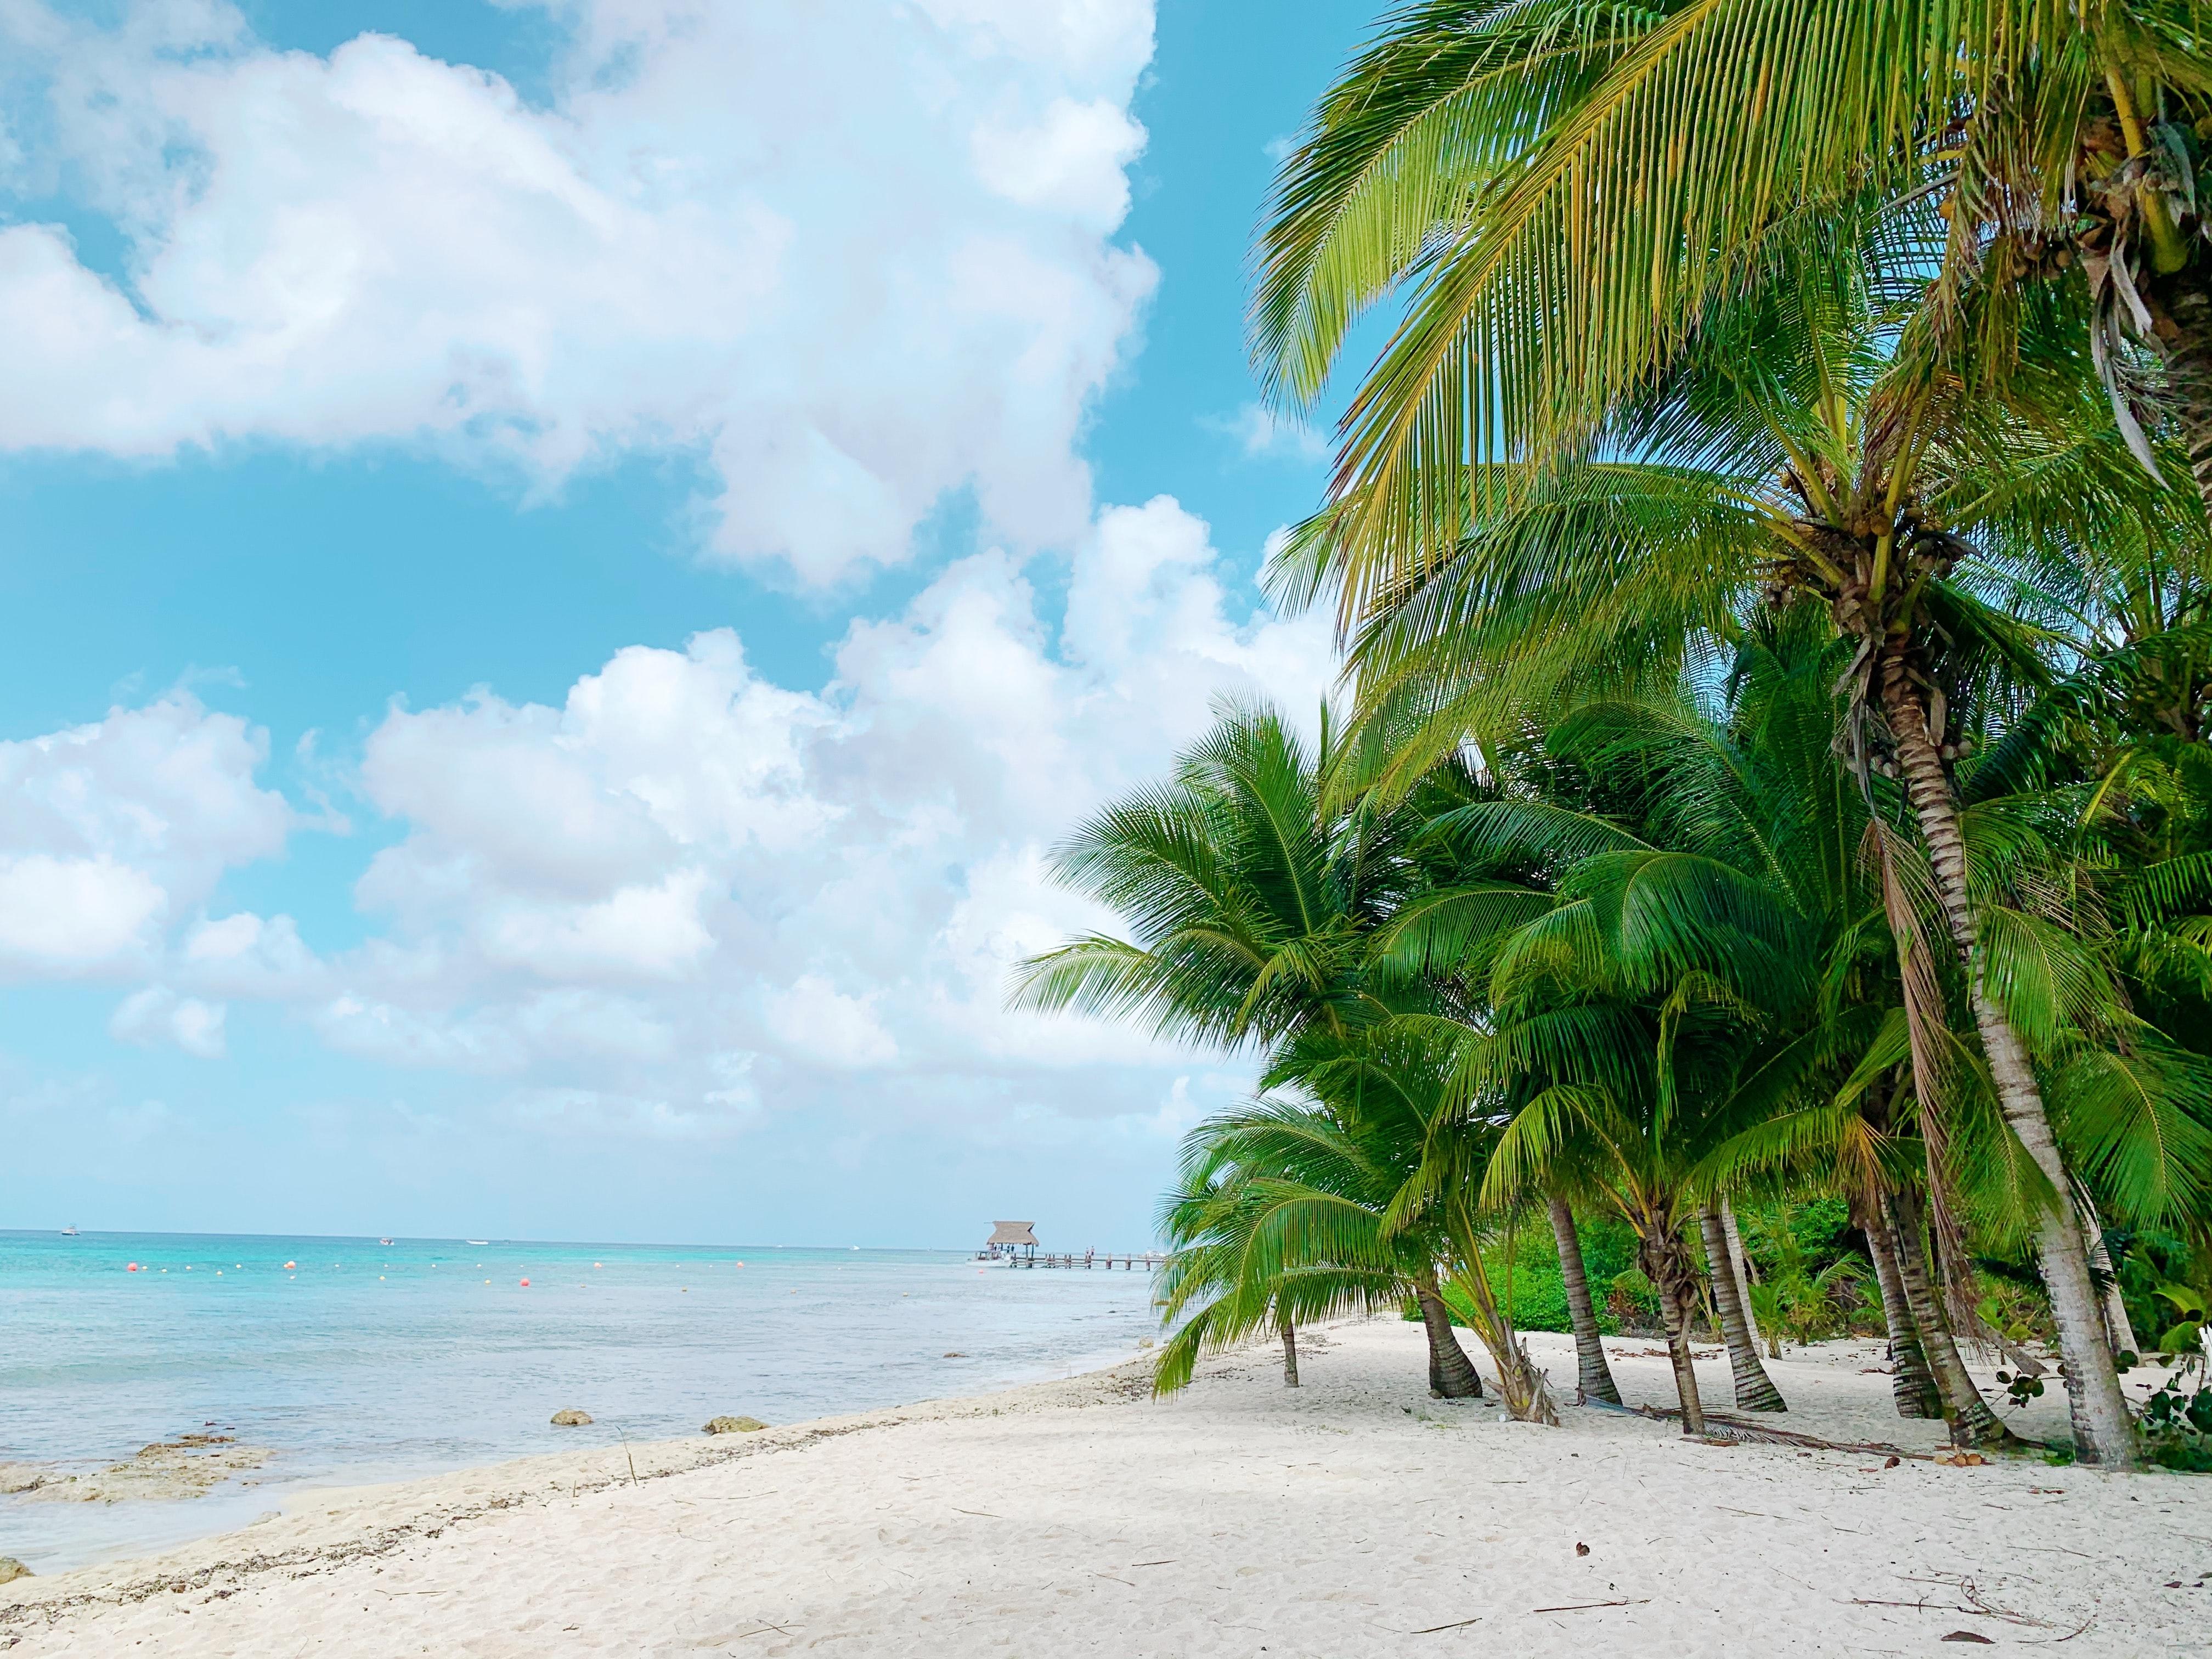 Cozumel-beaches-jpg